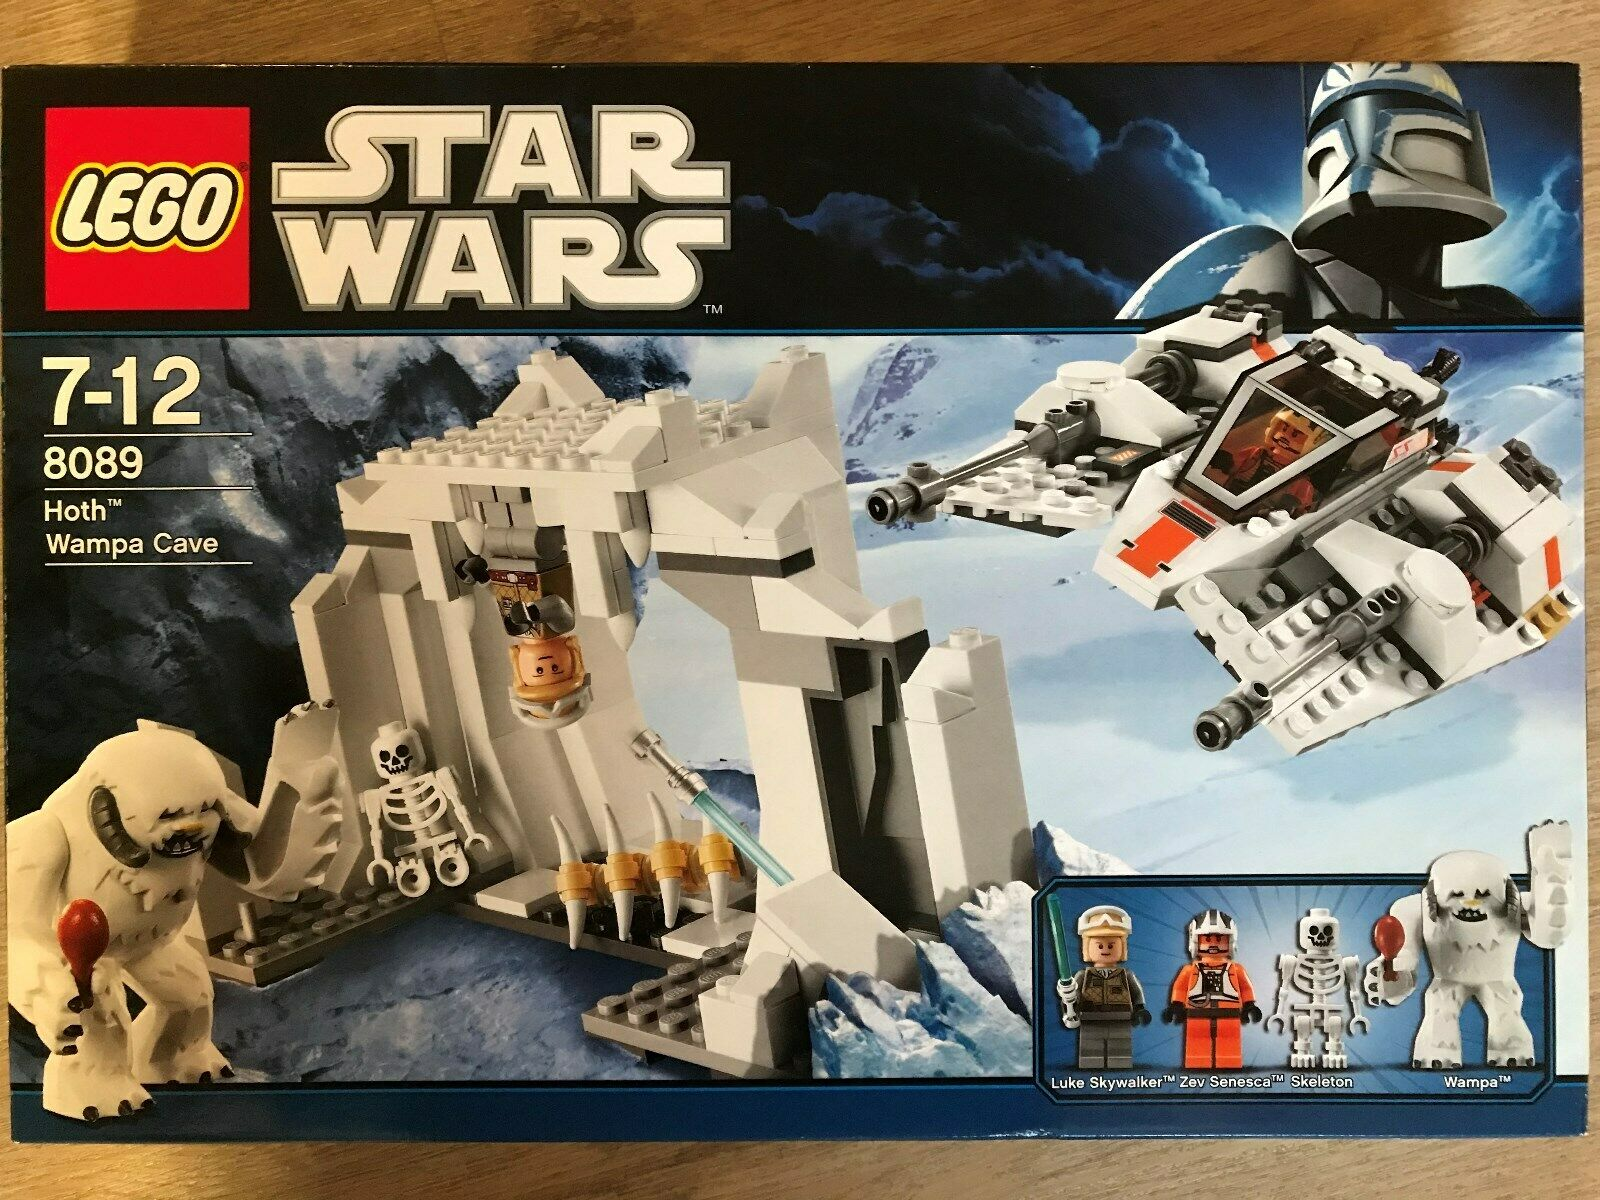 LEGO STAR WARS 8089 - Hoth Wampa Cave - i.O.V. Top Zustand m. Bauanl.